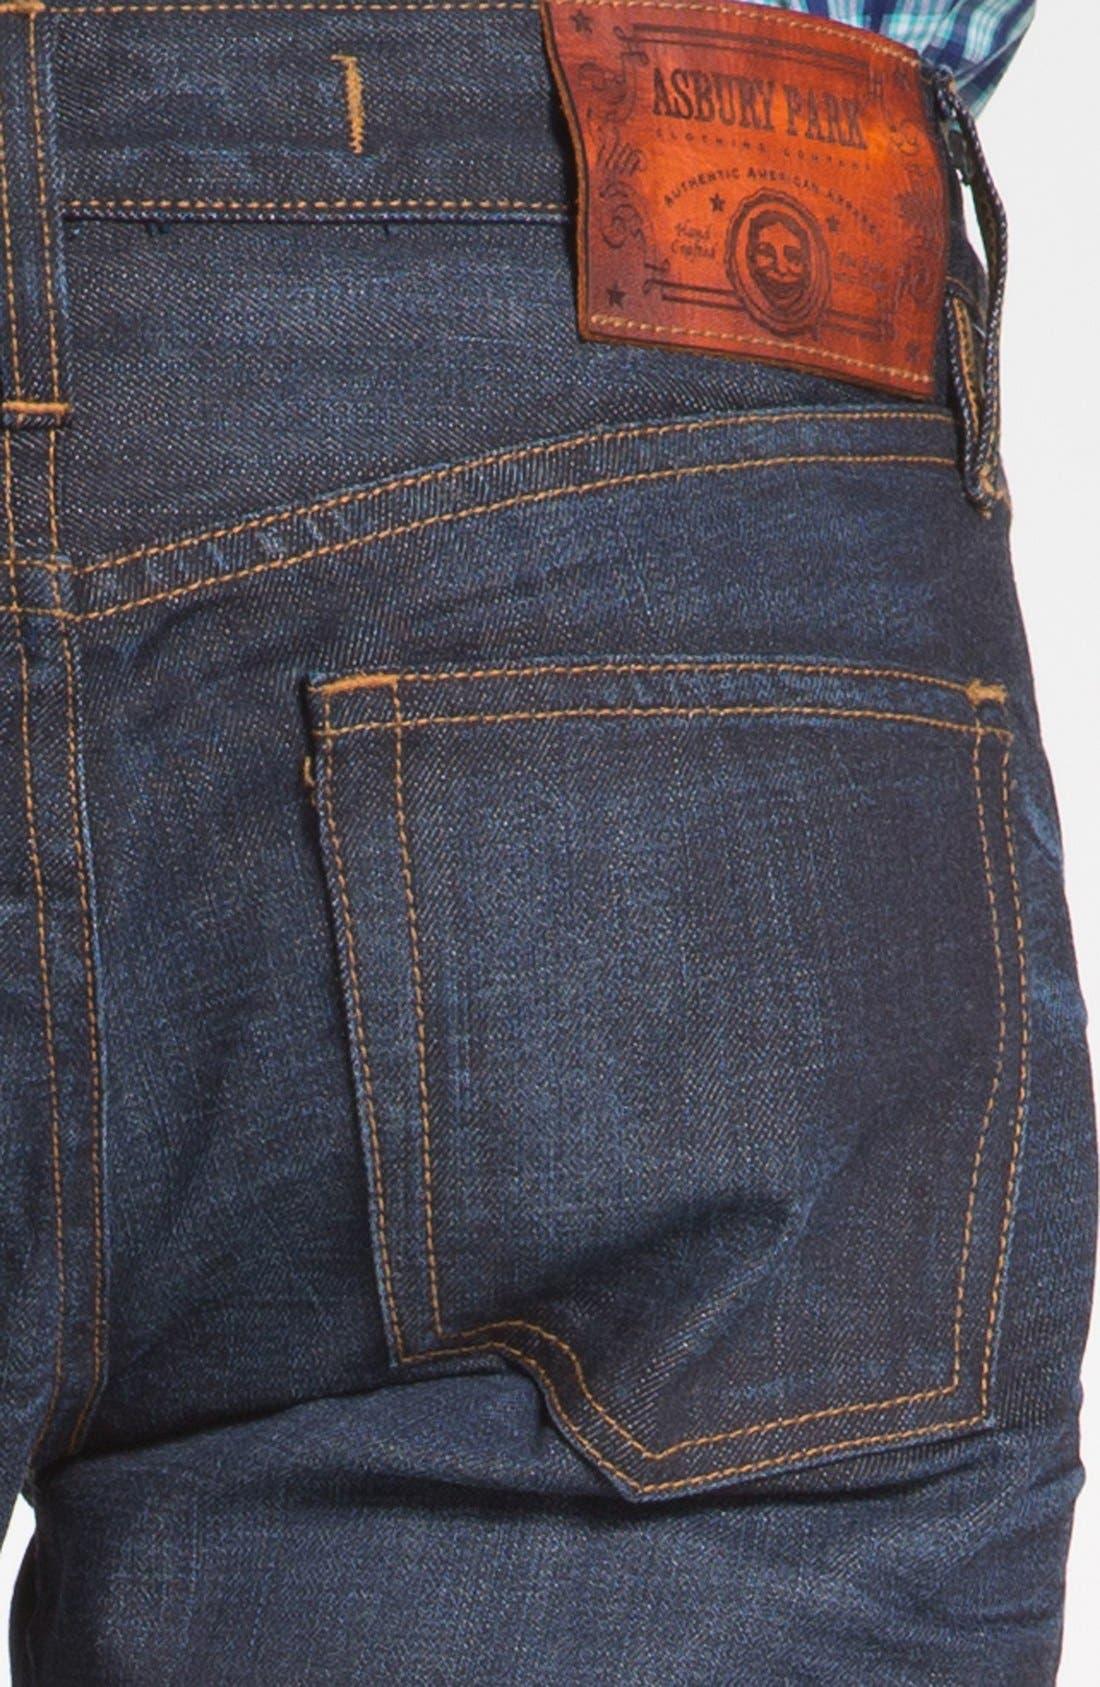 ASBURY PARK,                             '1888 Skinny Fit' Raw Selvedge Jeans,                             Alternate thumbnail 2, color,                             401